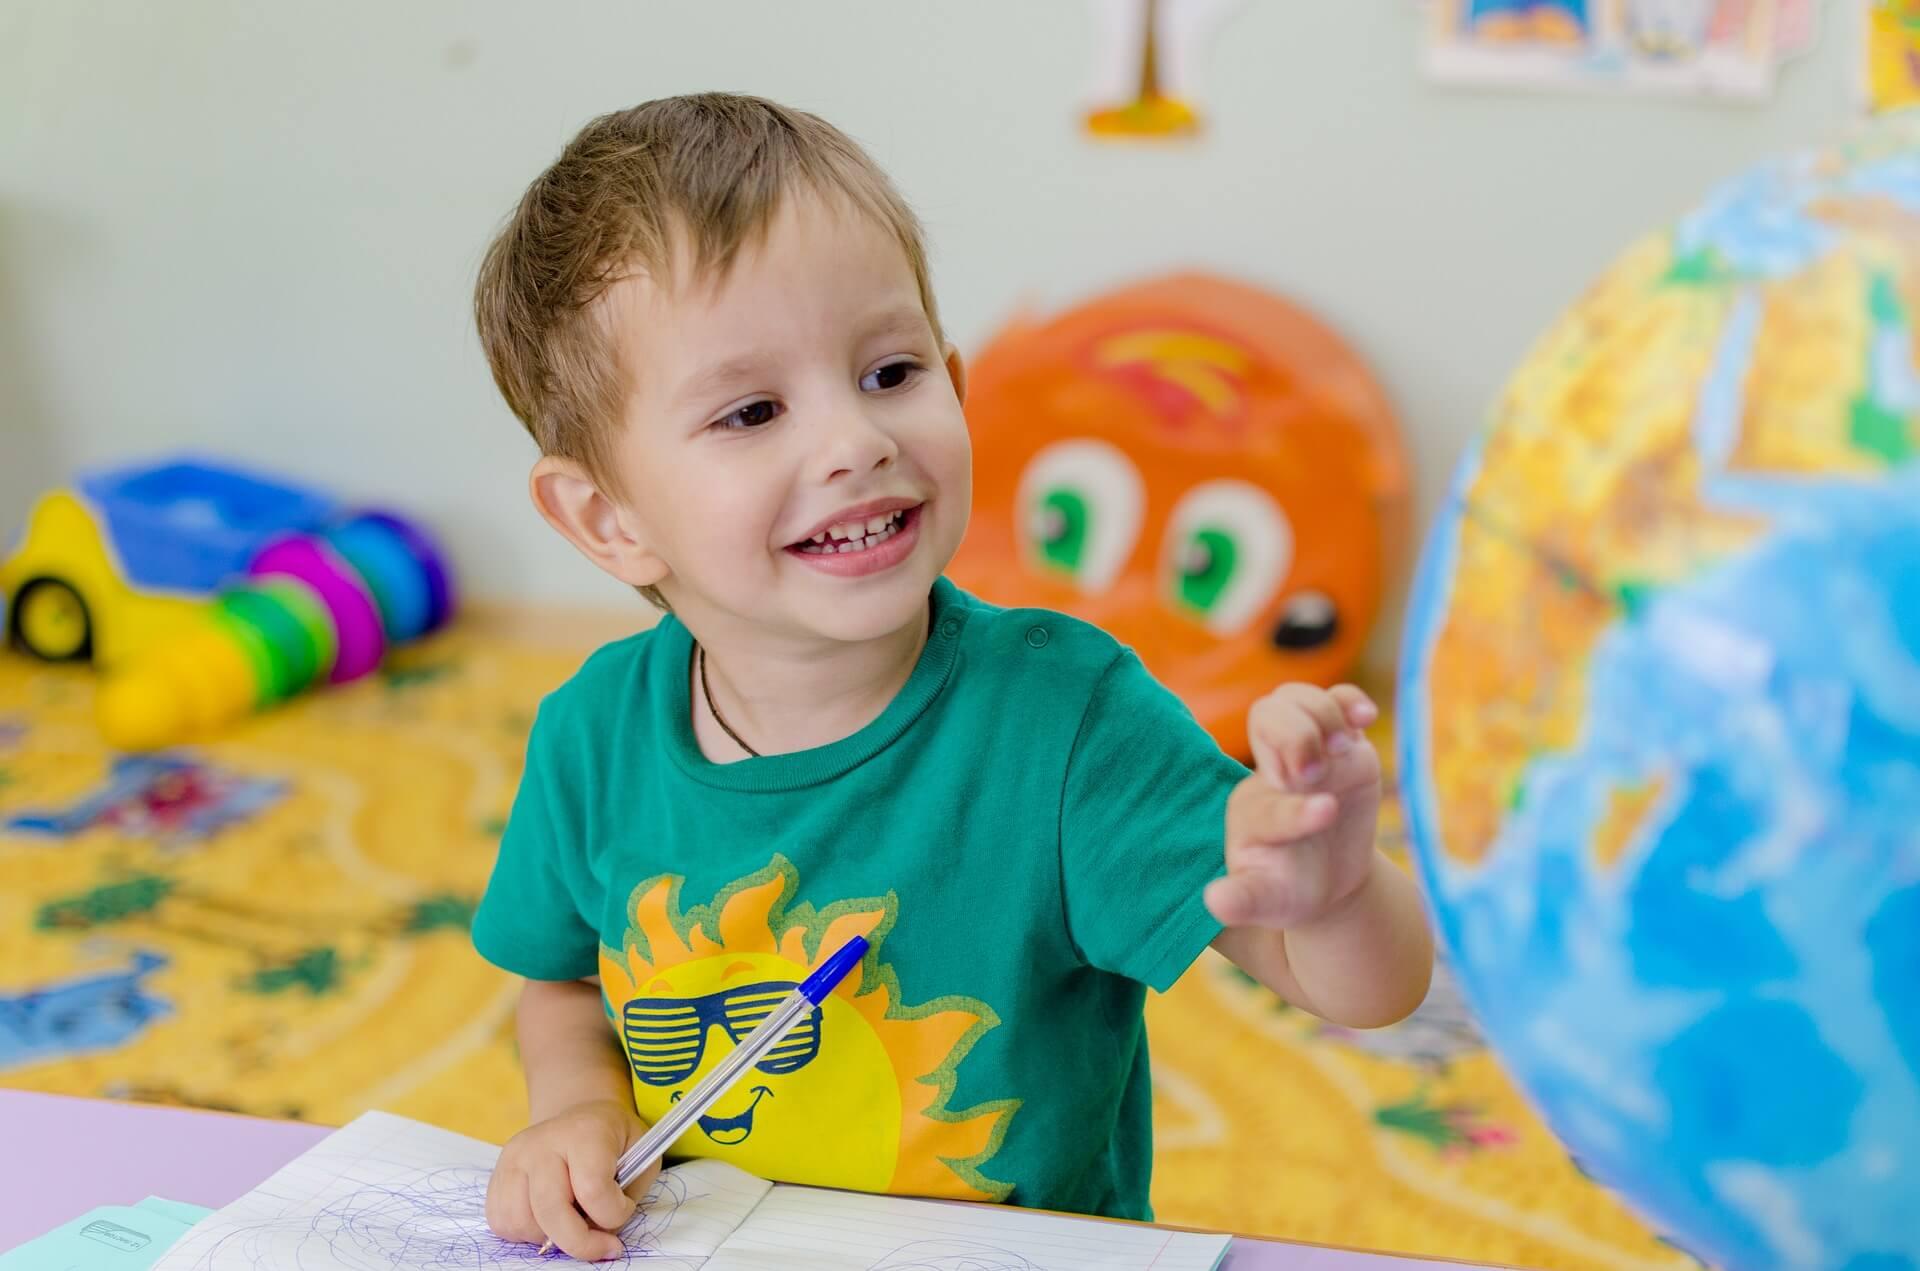 10 Kindergarten Geography Activities to Make Their World